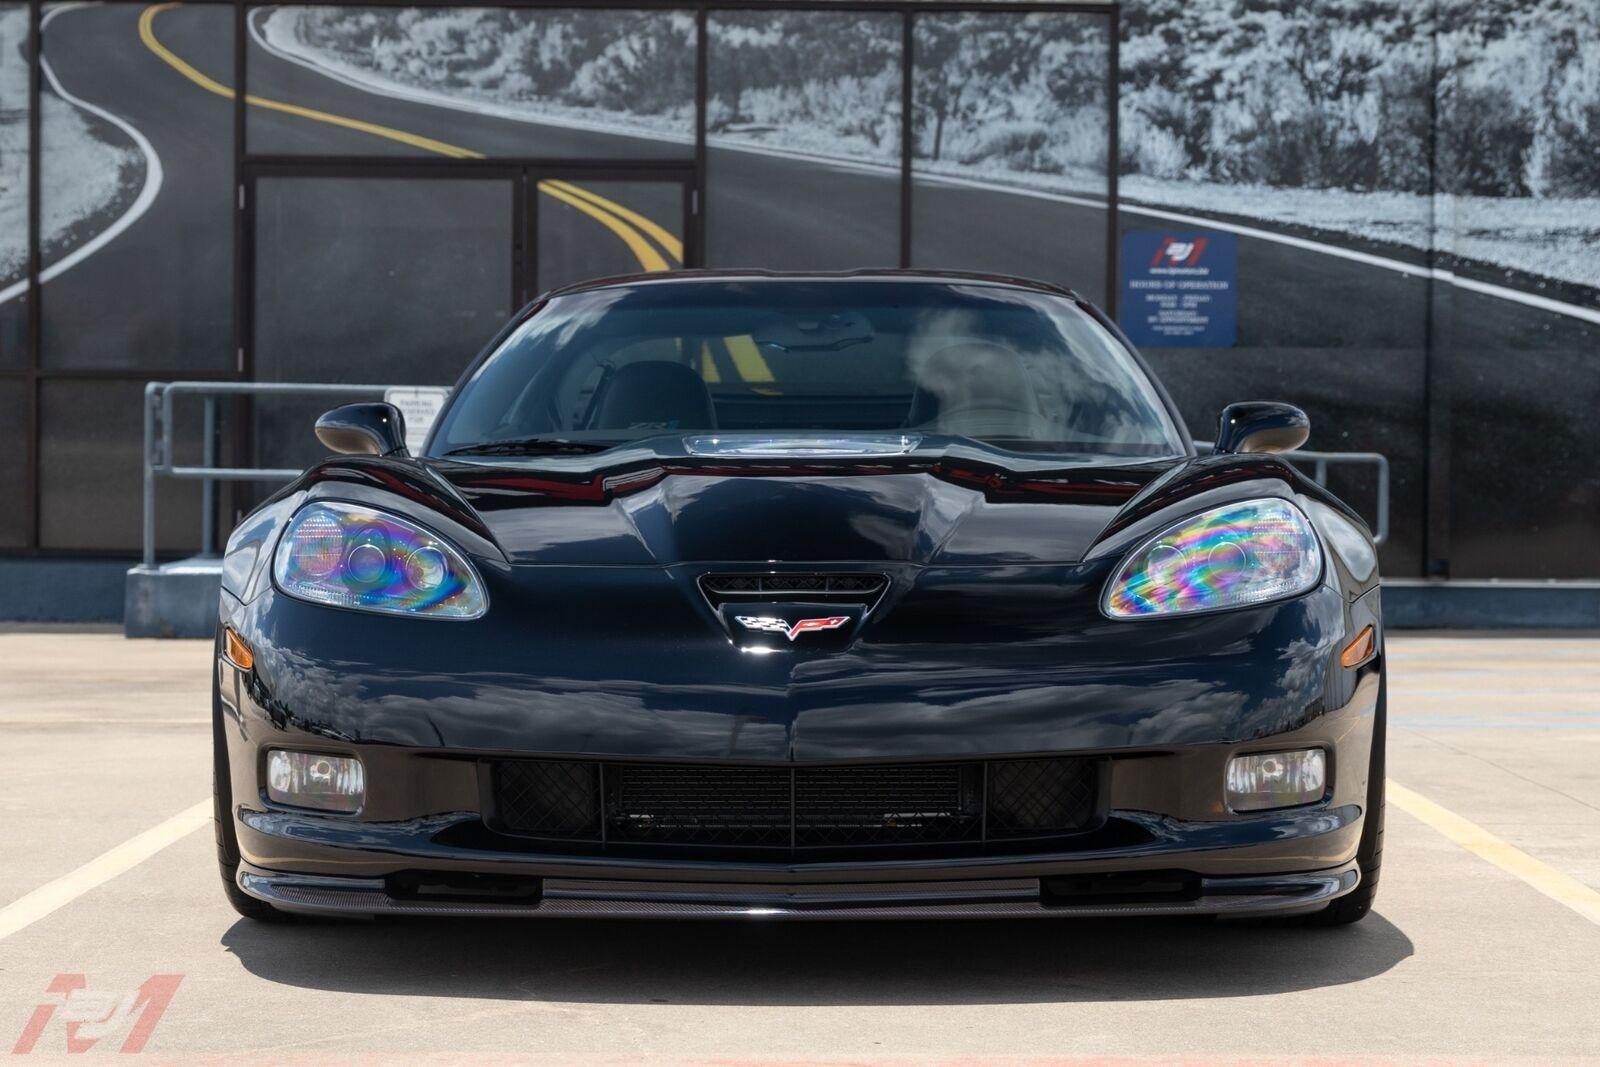 2009 Black Chevrolet Corvette ZR1    C6 Corvette Photo 3